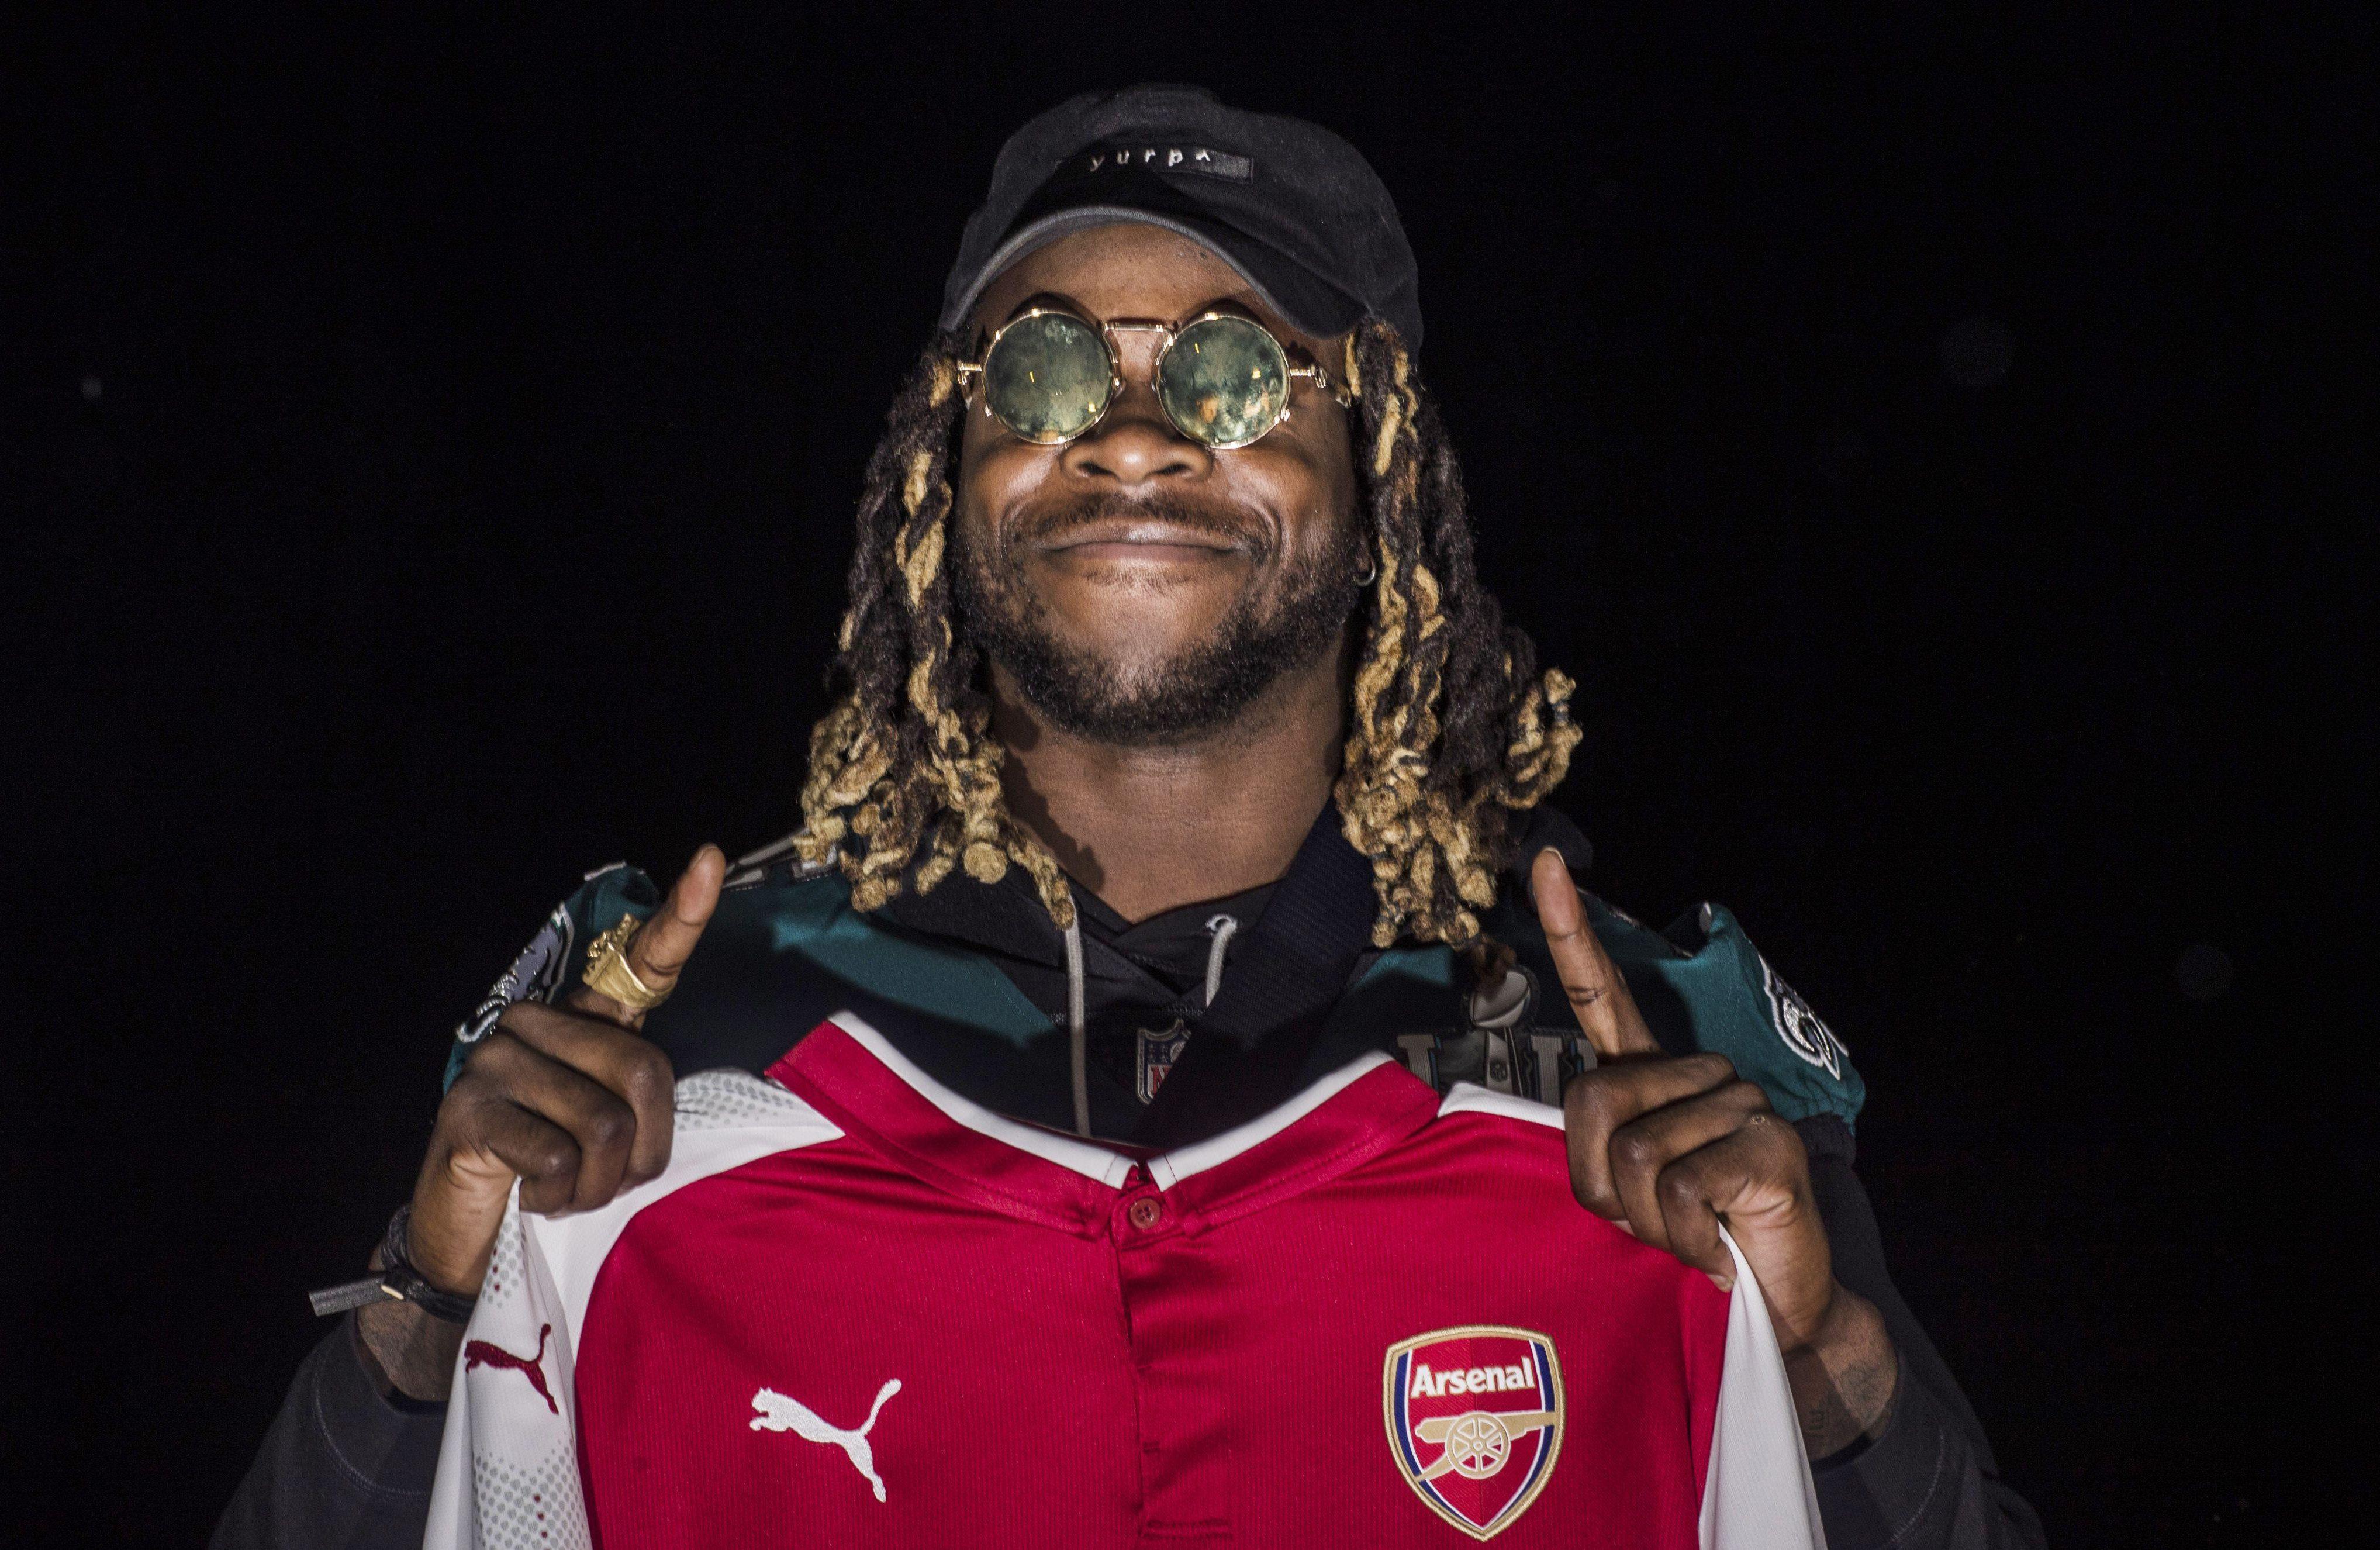 Ajayi holds aloft an Arsenal kit